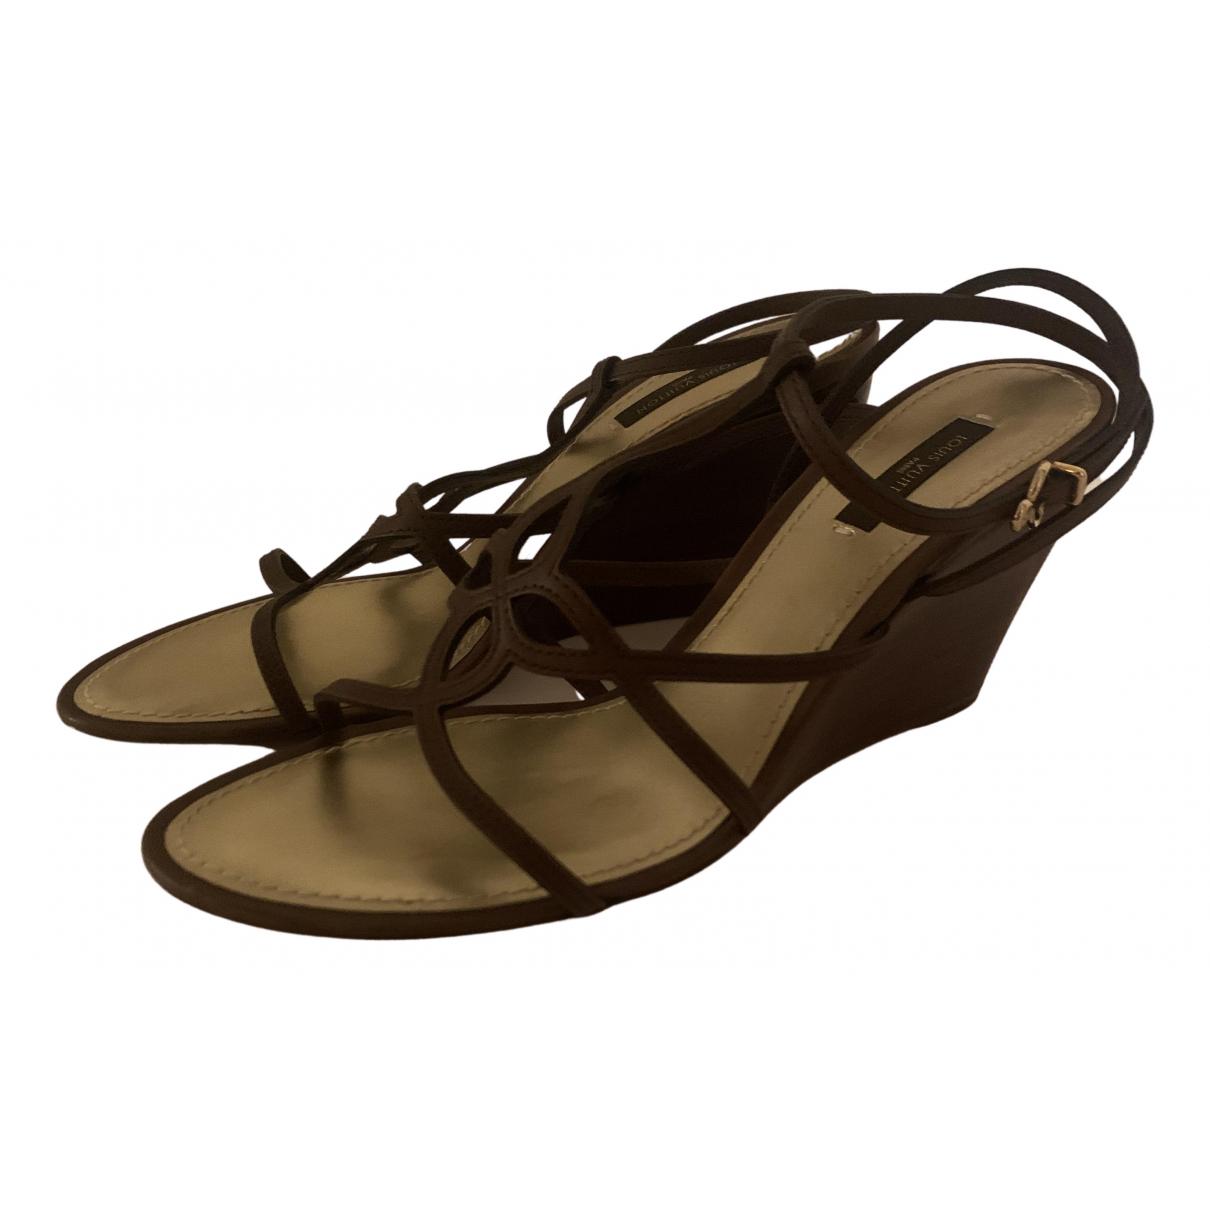 Louis Vuitton N Brown Leather Heels for Women 38 EU